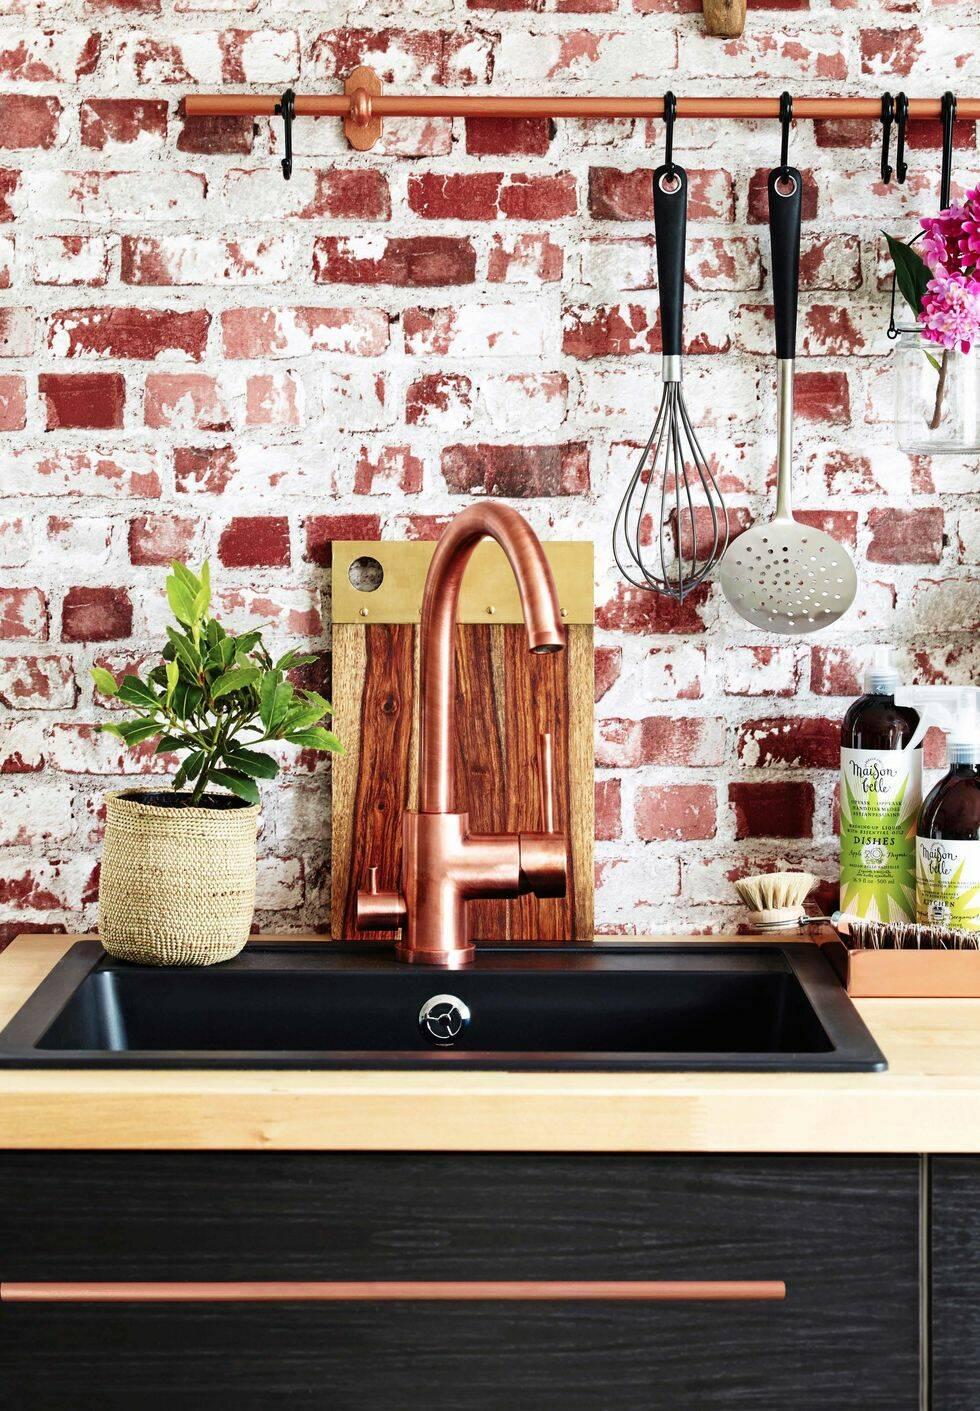 Franskt bistrokök – så skapar du stilen hemma